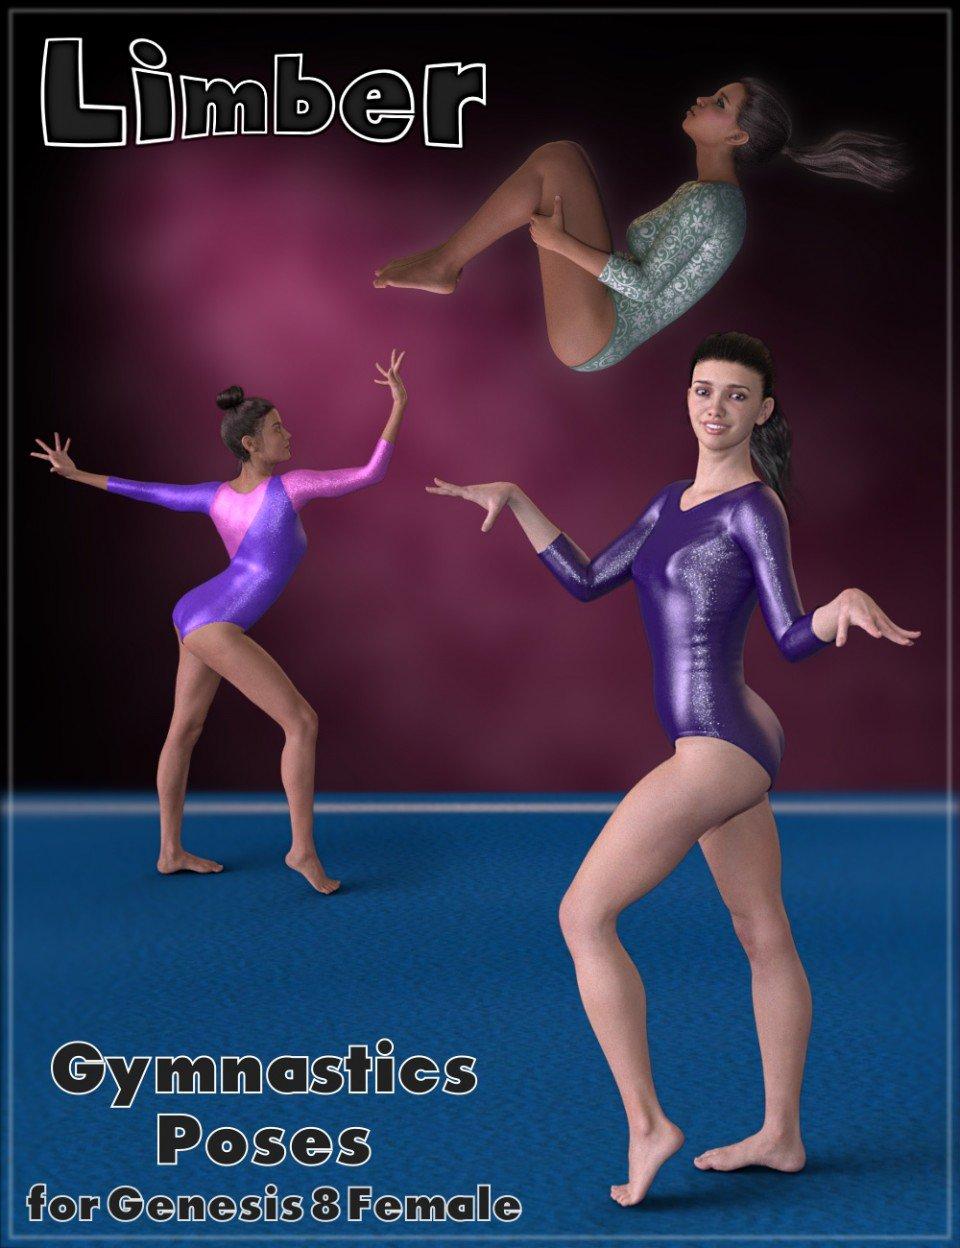 limber-–-gymnastic-poses-for-genesis-8-female